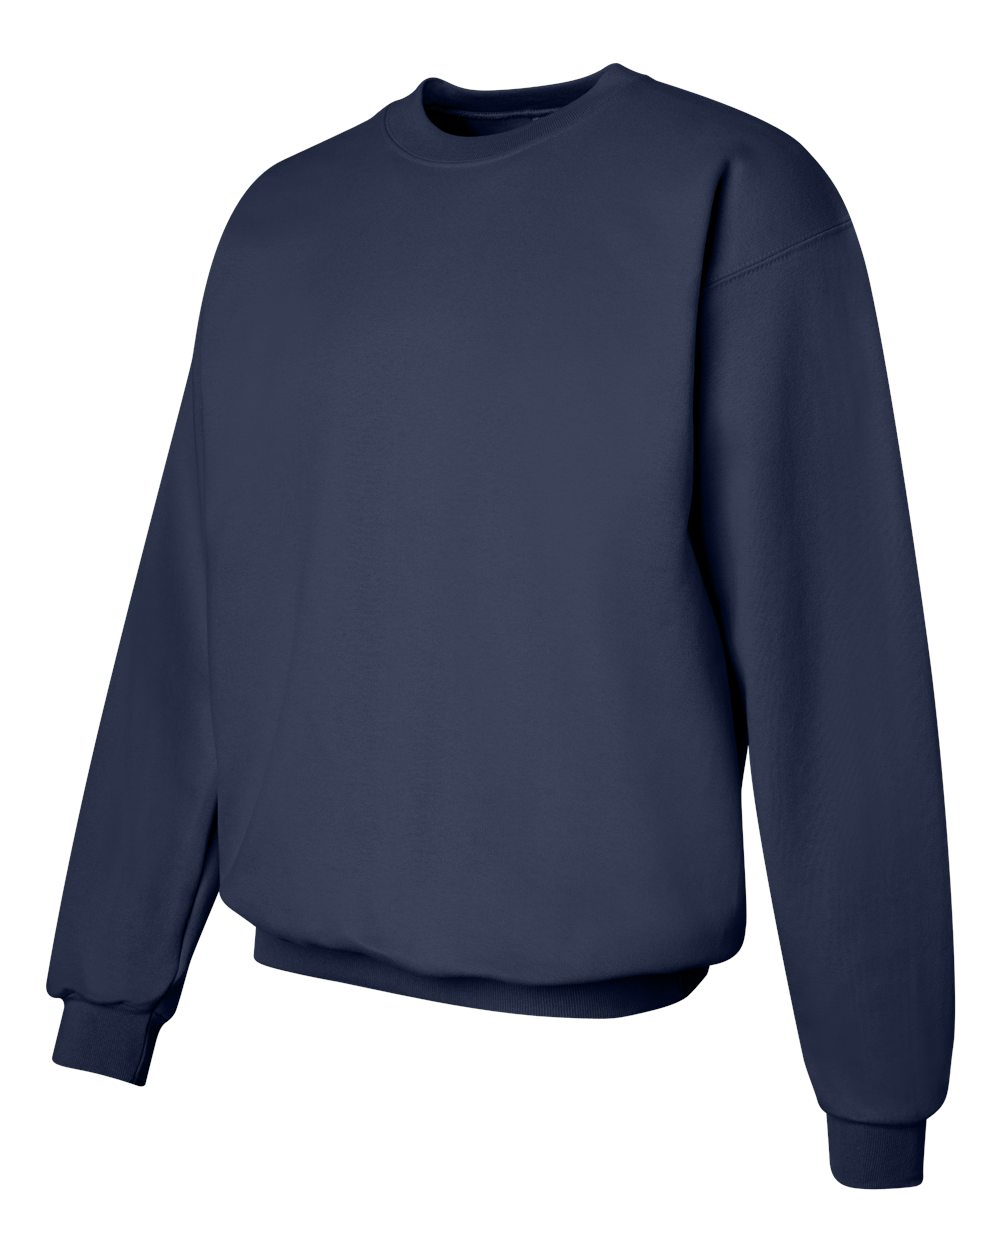 Hanes Men/'s 9.7 oz Cotton 90//10 Fleece Crew F260 S-2XL